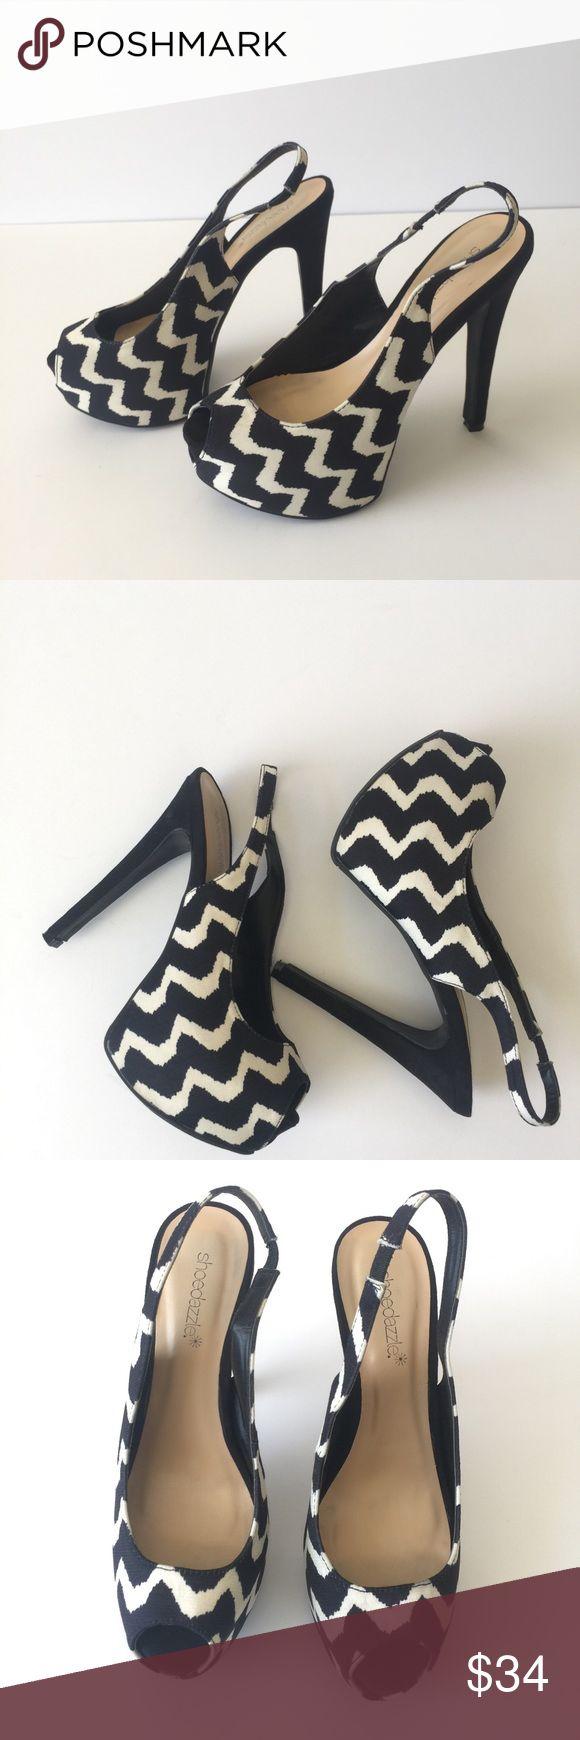 ❤SHOE DAZZLE, SZ 8, BLACK/WHITE HEEL/PLATFORM❤ Size 8, Shoe Dazzle, Black/White Heel/Platform. Worn once. Excellent condition. Shoe Dazzle Shoes Platforms